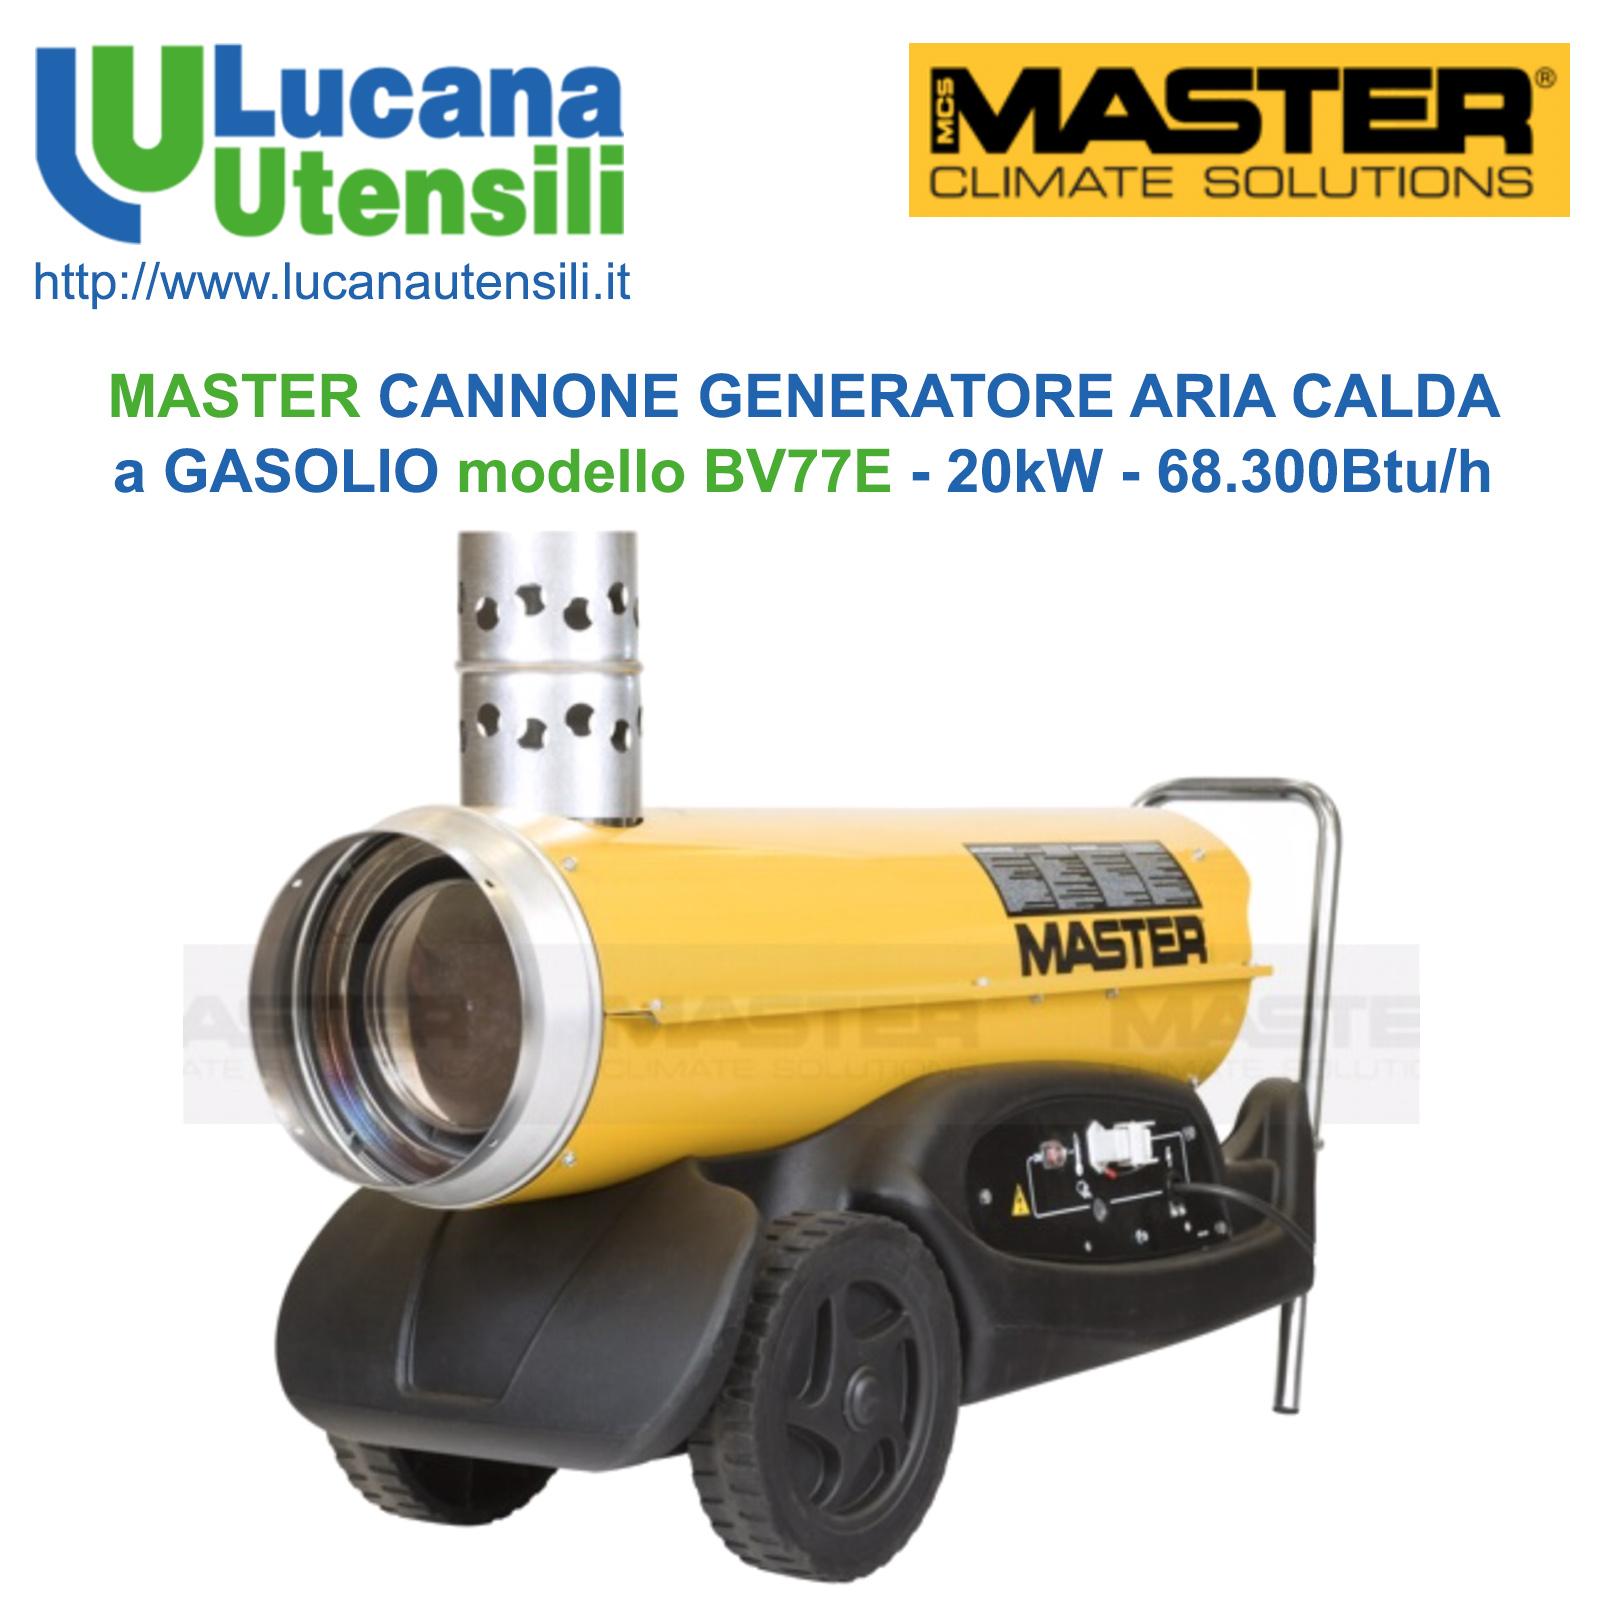 MASTER CANNONE GENERATORE ARIA CALDA A GASOLIO